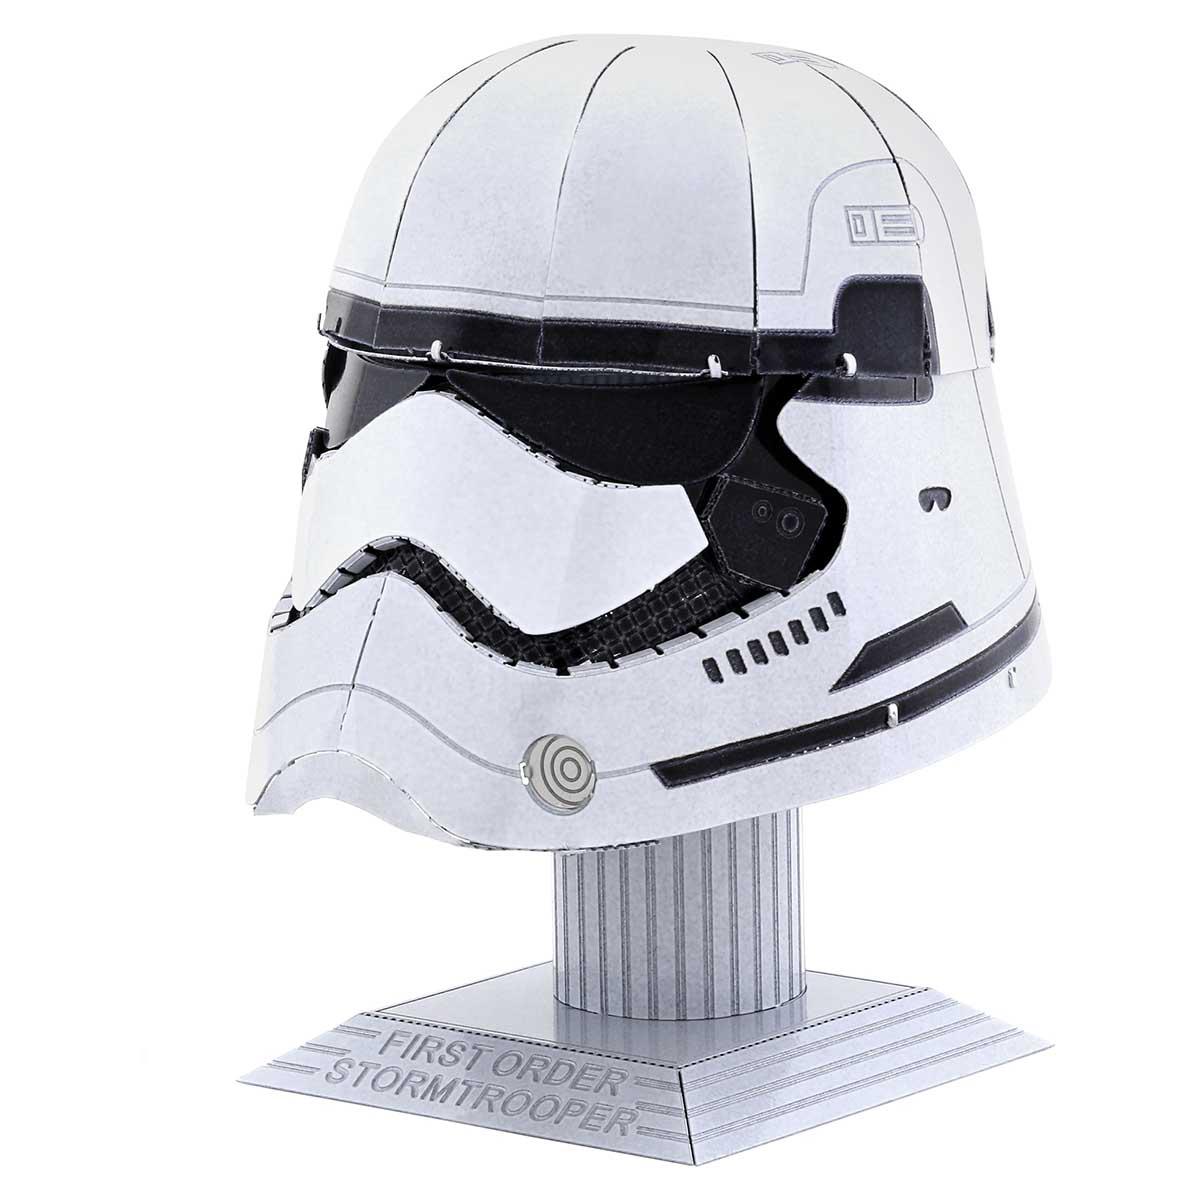 Stormtrooper Helmet Movies / Books / TV Metal Puzzles